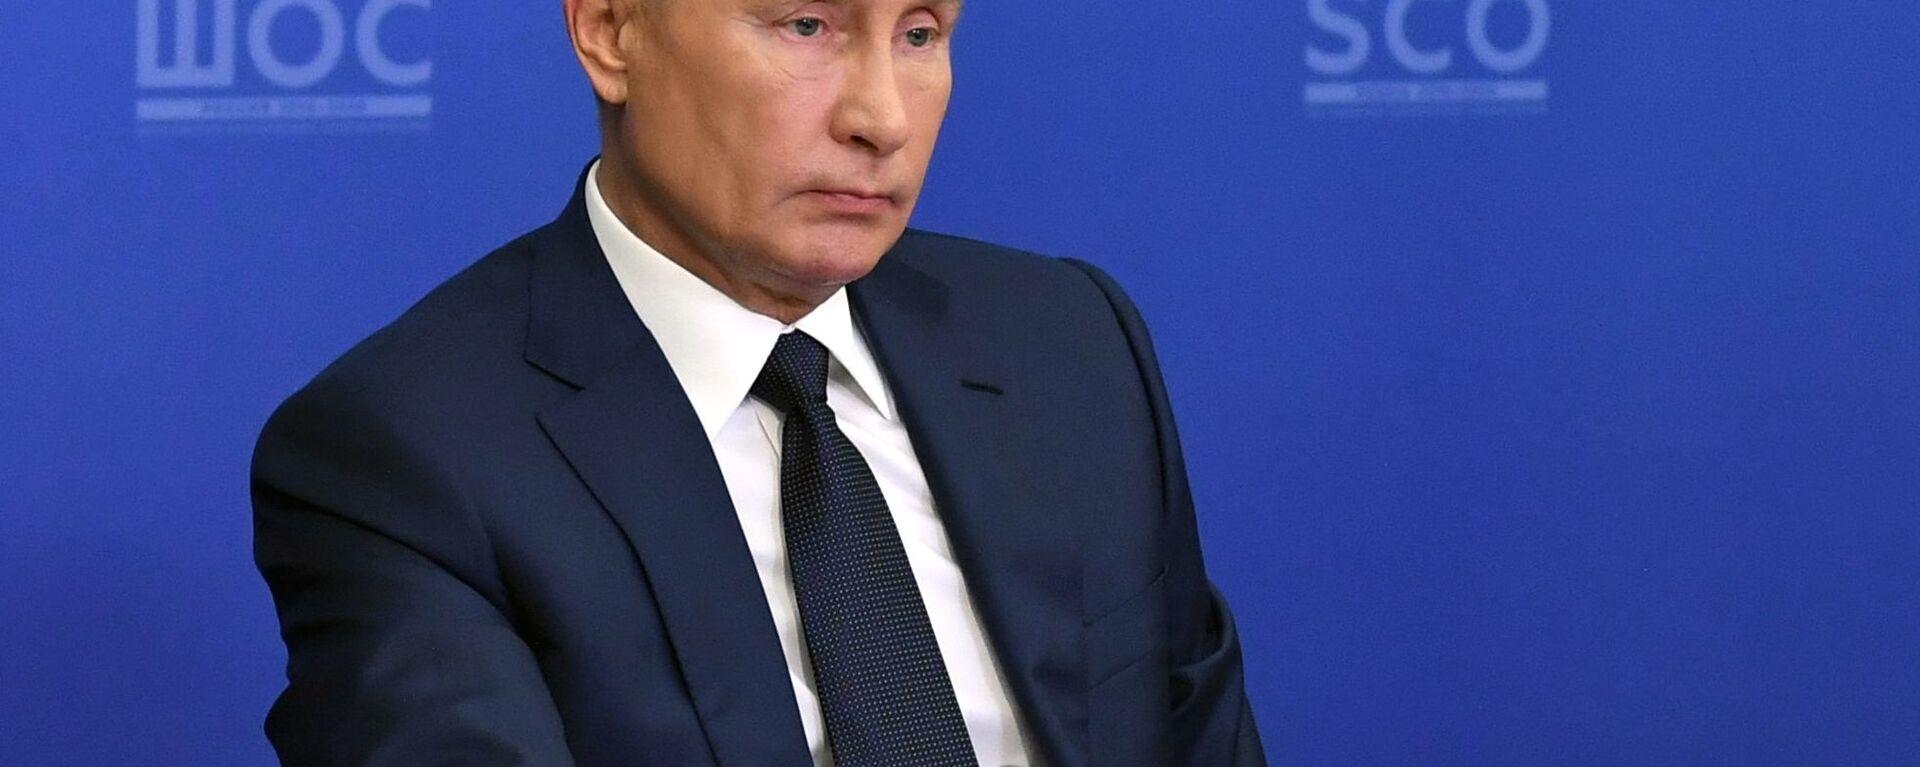 Predsednik Rusije Vladimir Putin - Sputnik Srbija, 1920, 17.09.2021